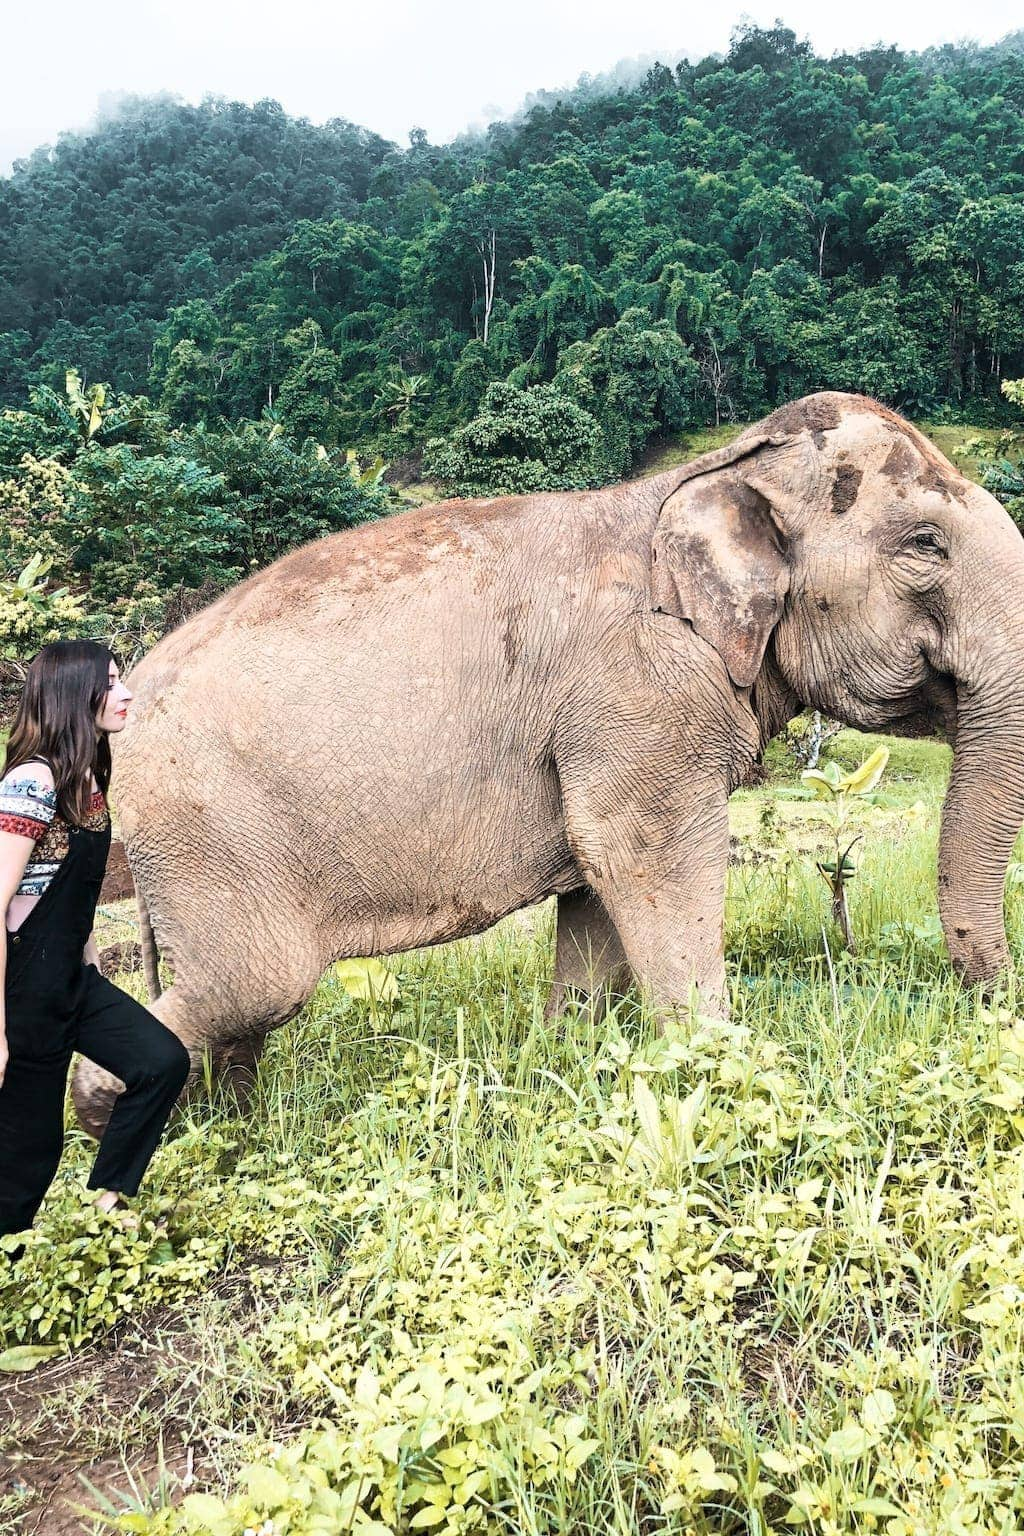 Ethical Elephant Sanctuary: Hiking with an elephant